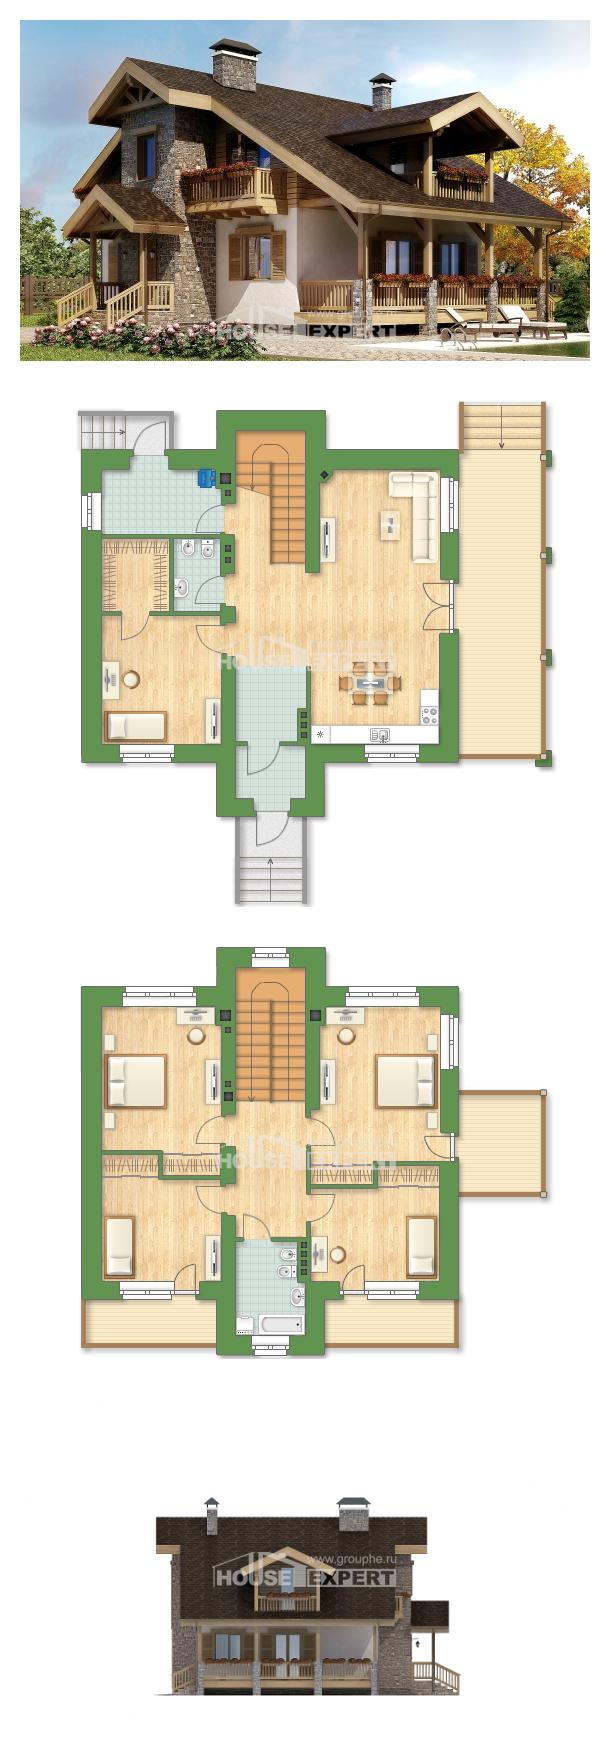 Projekt domu 150-004-R | House Expert